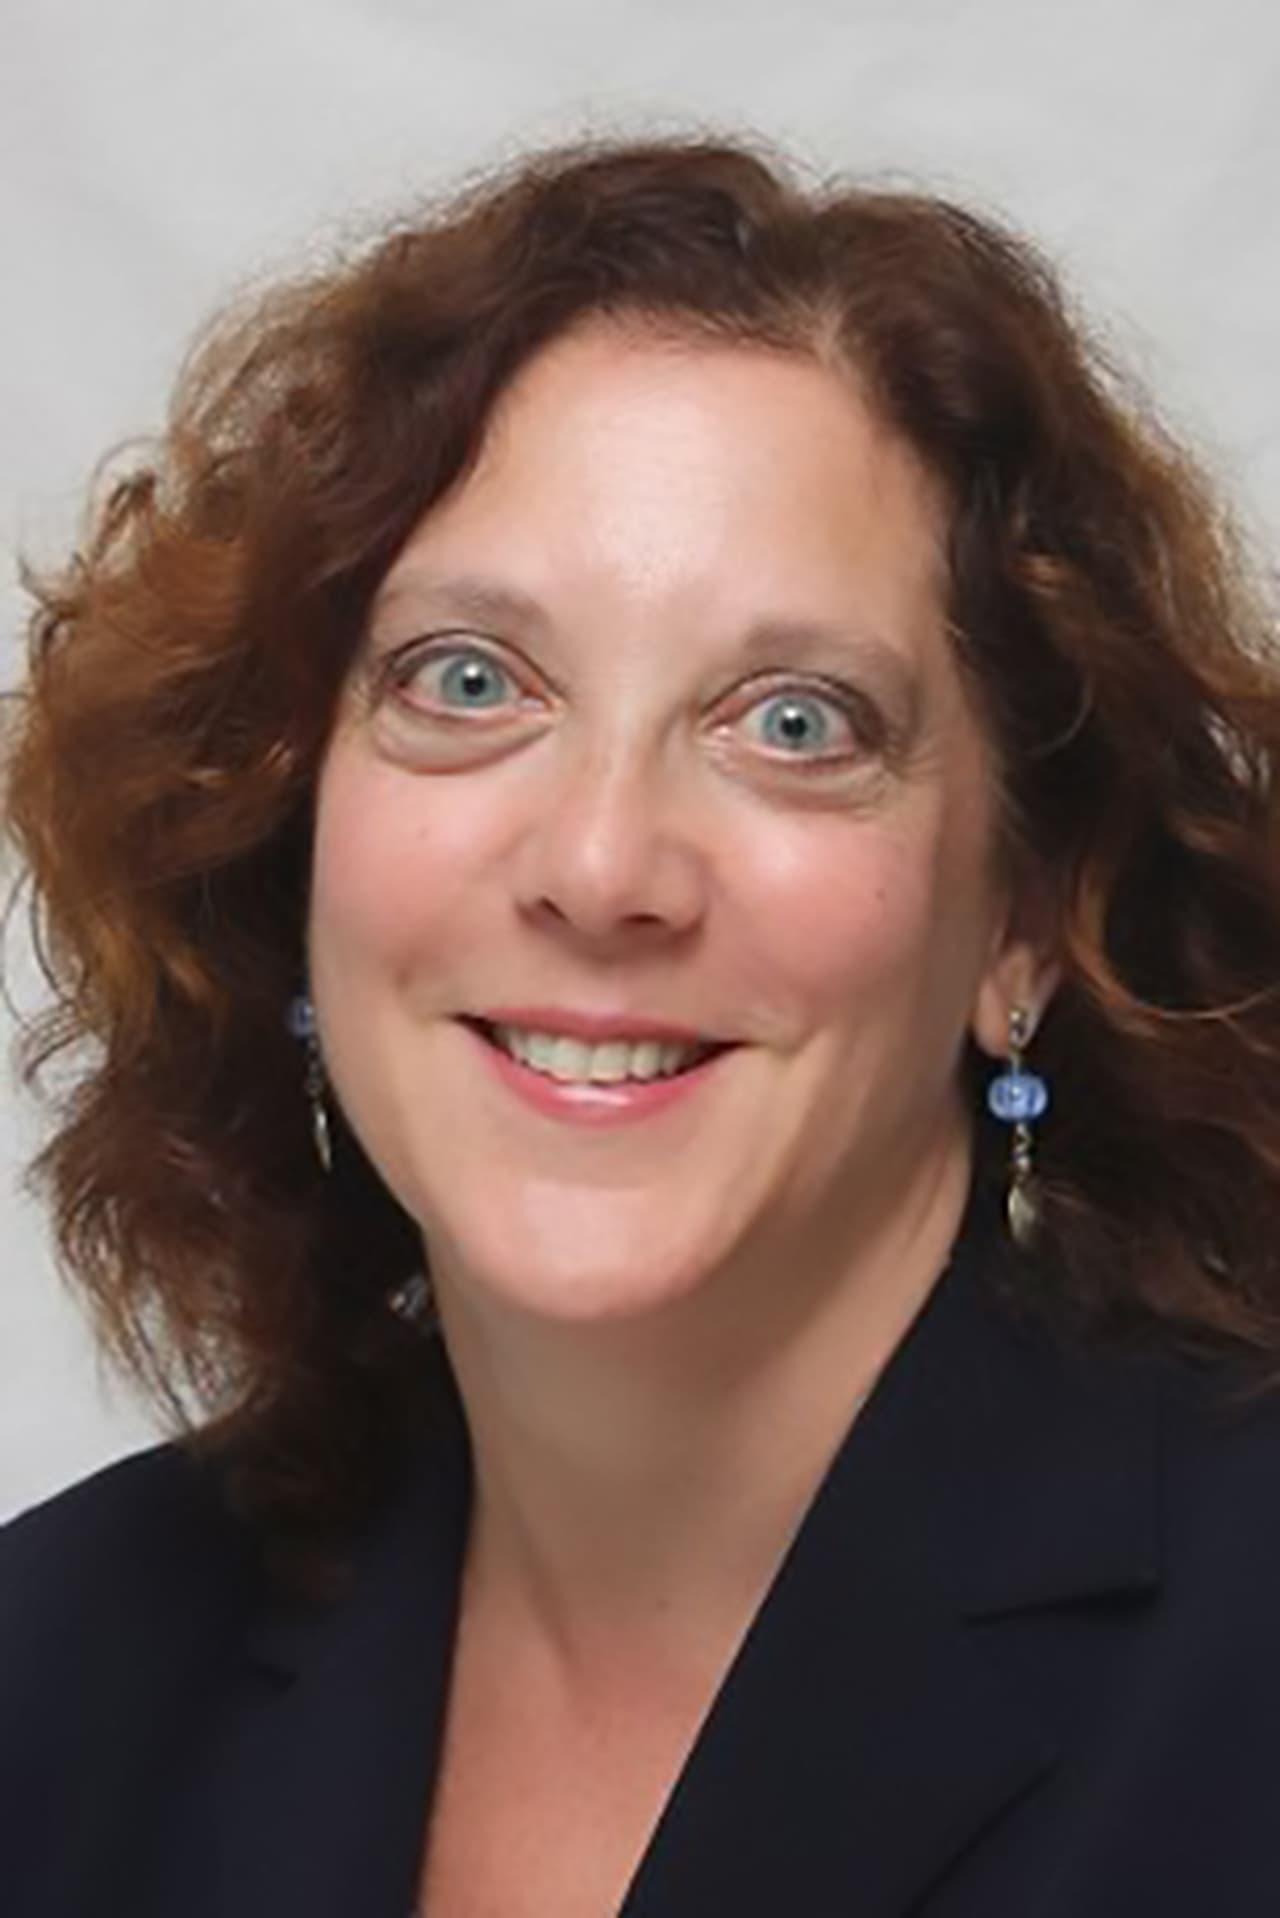 Carolyn DeMirjian